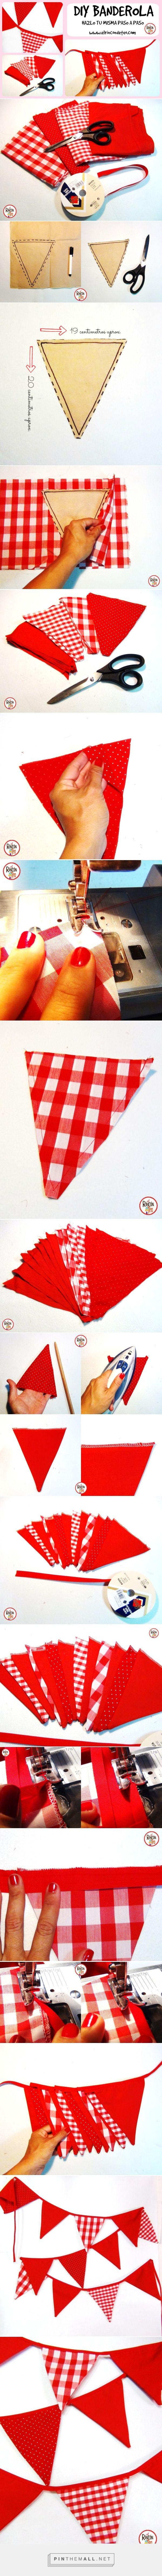 Como hacer una Banderola / Hazlo tu misma con este tutorial! How to make a fabric banner DIY Tutorial! http://www.elrincondeteo.com #diytutorial #tutorialdiy #tutorial #hazlotumisma #handmade #hechoamano #madeinbcn #crafts #how #howtomake #fabricbanner #diy #banderola #como #comohacer #sewingtutorial #tutorialcostura #elrincondeteo - created via http://pinthemall.net